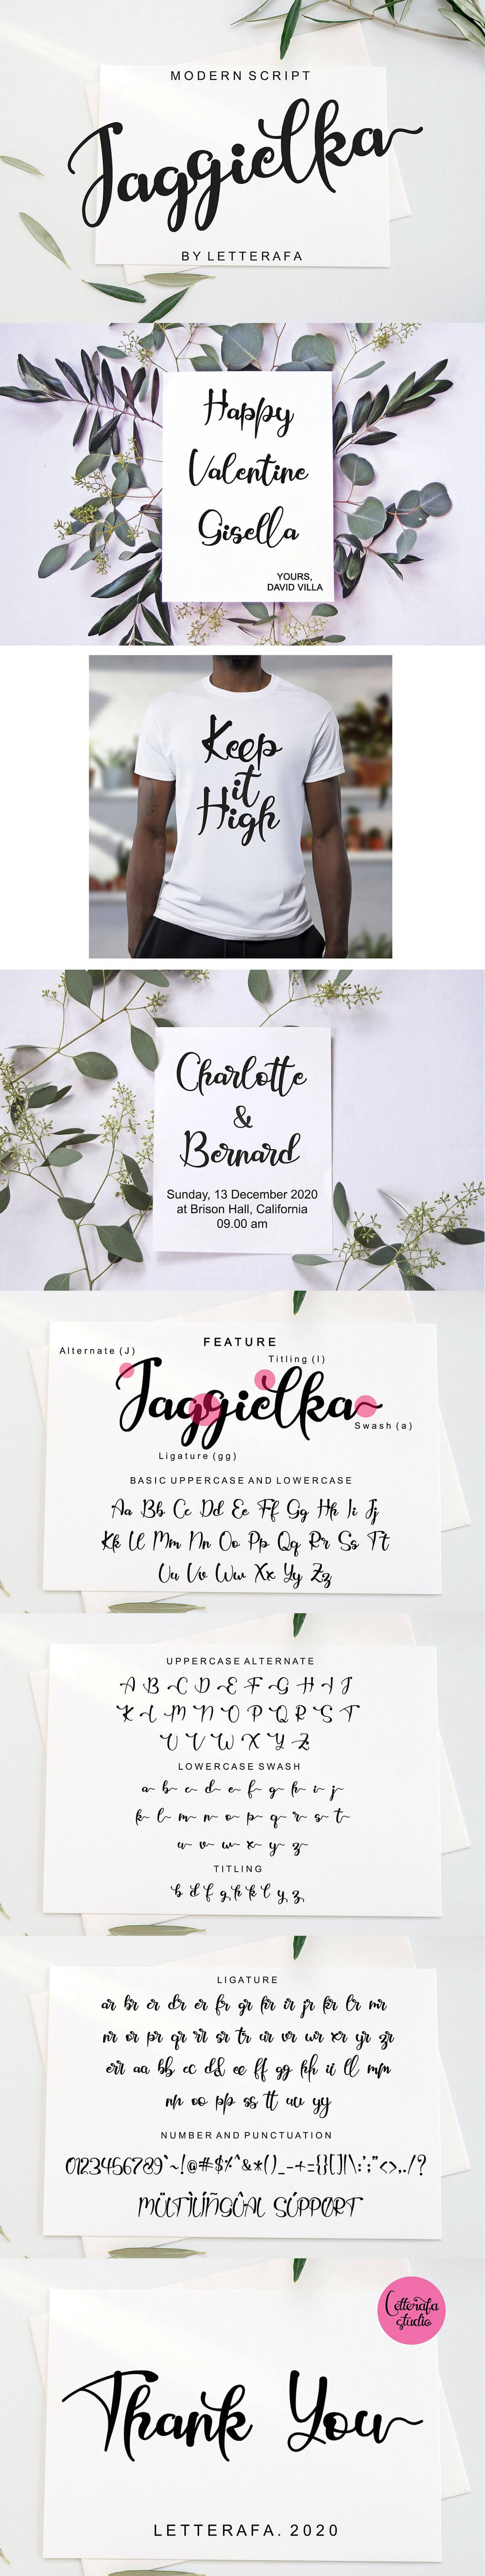 Jaggielka Calligraphy Font